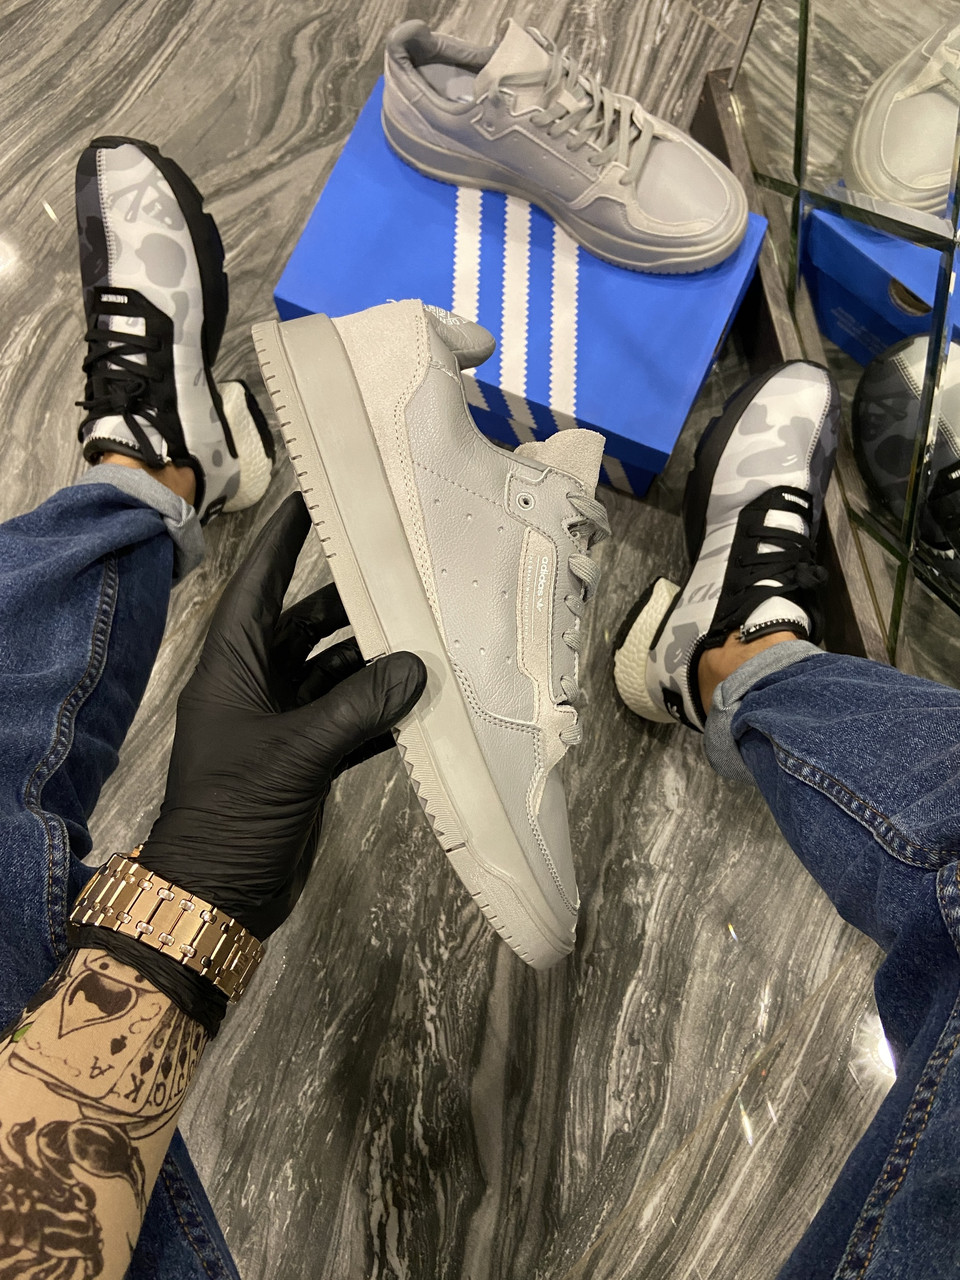 Adidas Brand With The 3 Stripes Grey (Серый)